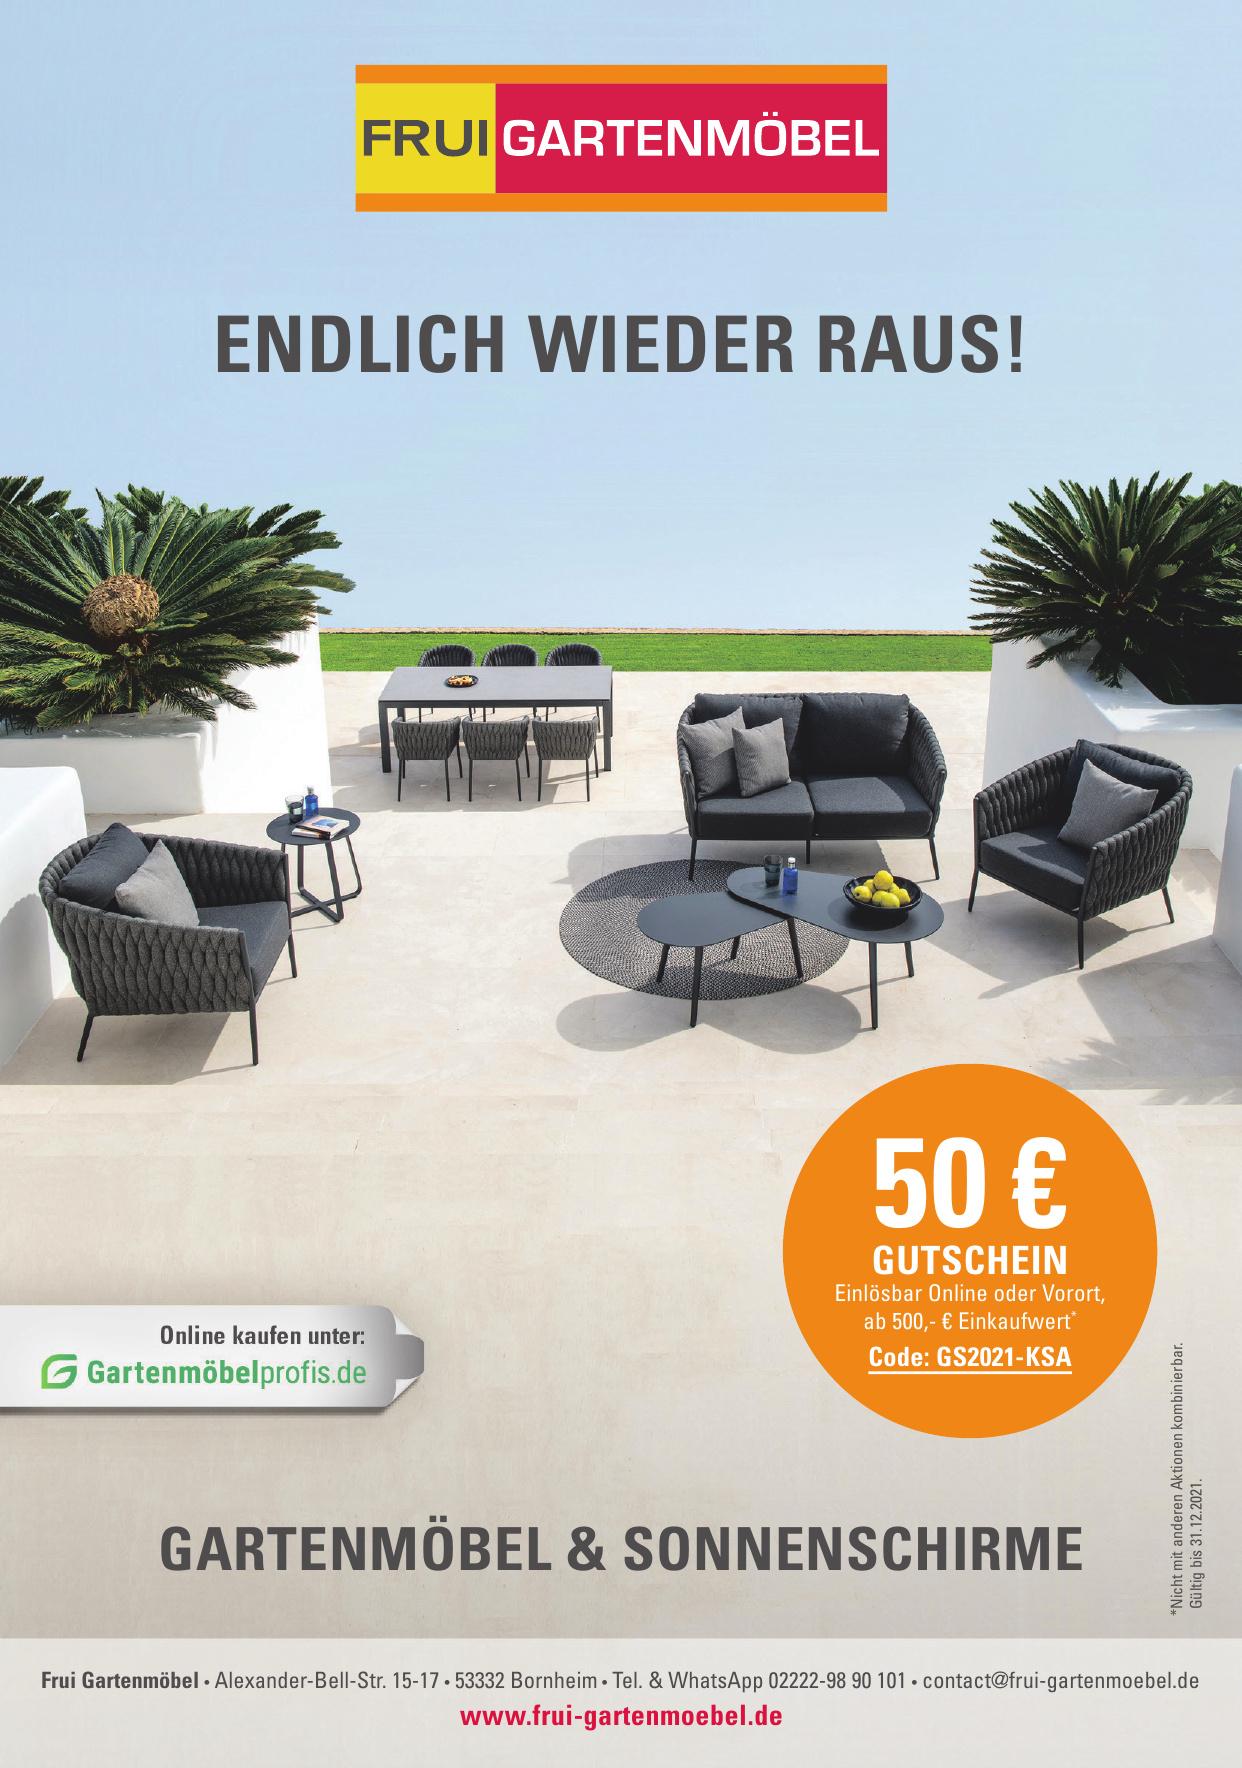 Frui Gartenmöbel GmbH